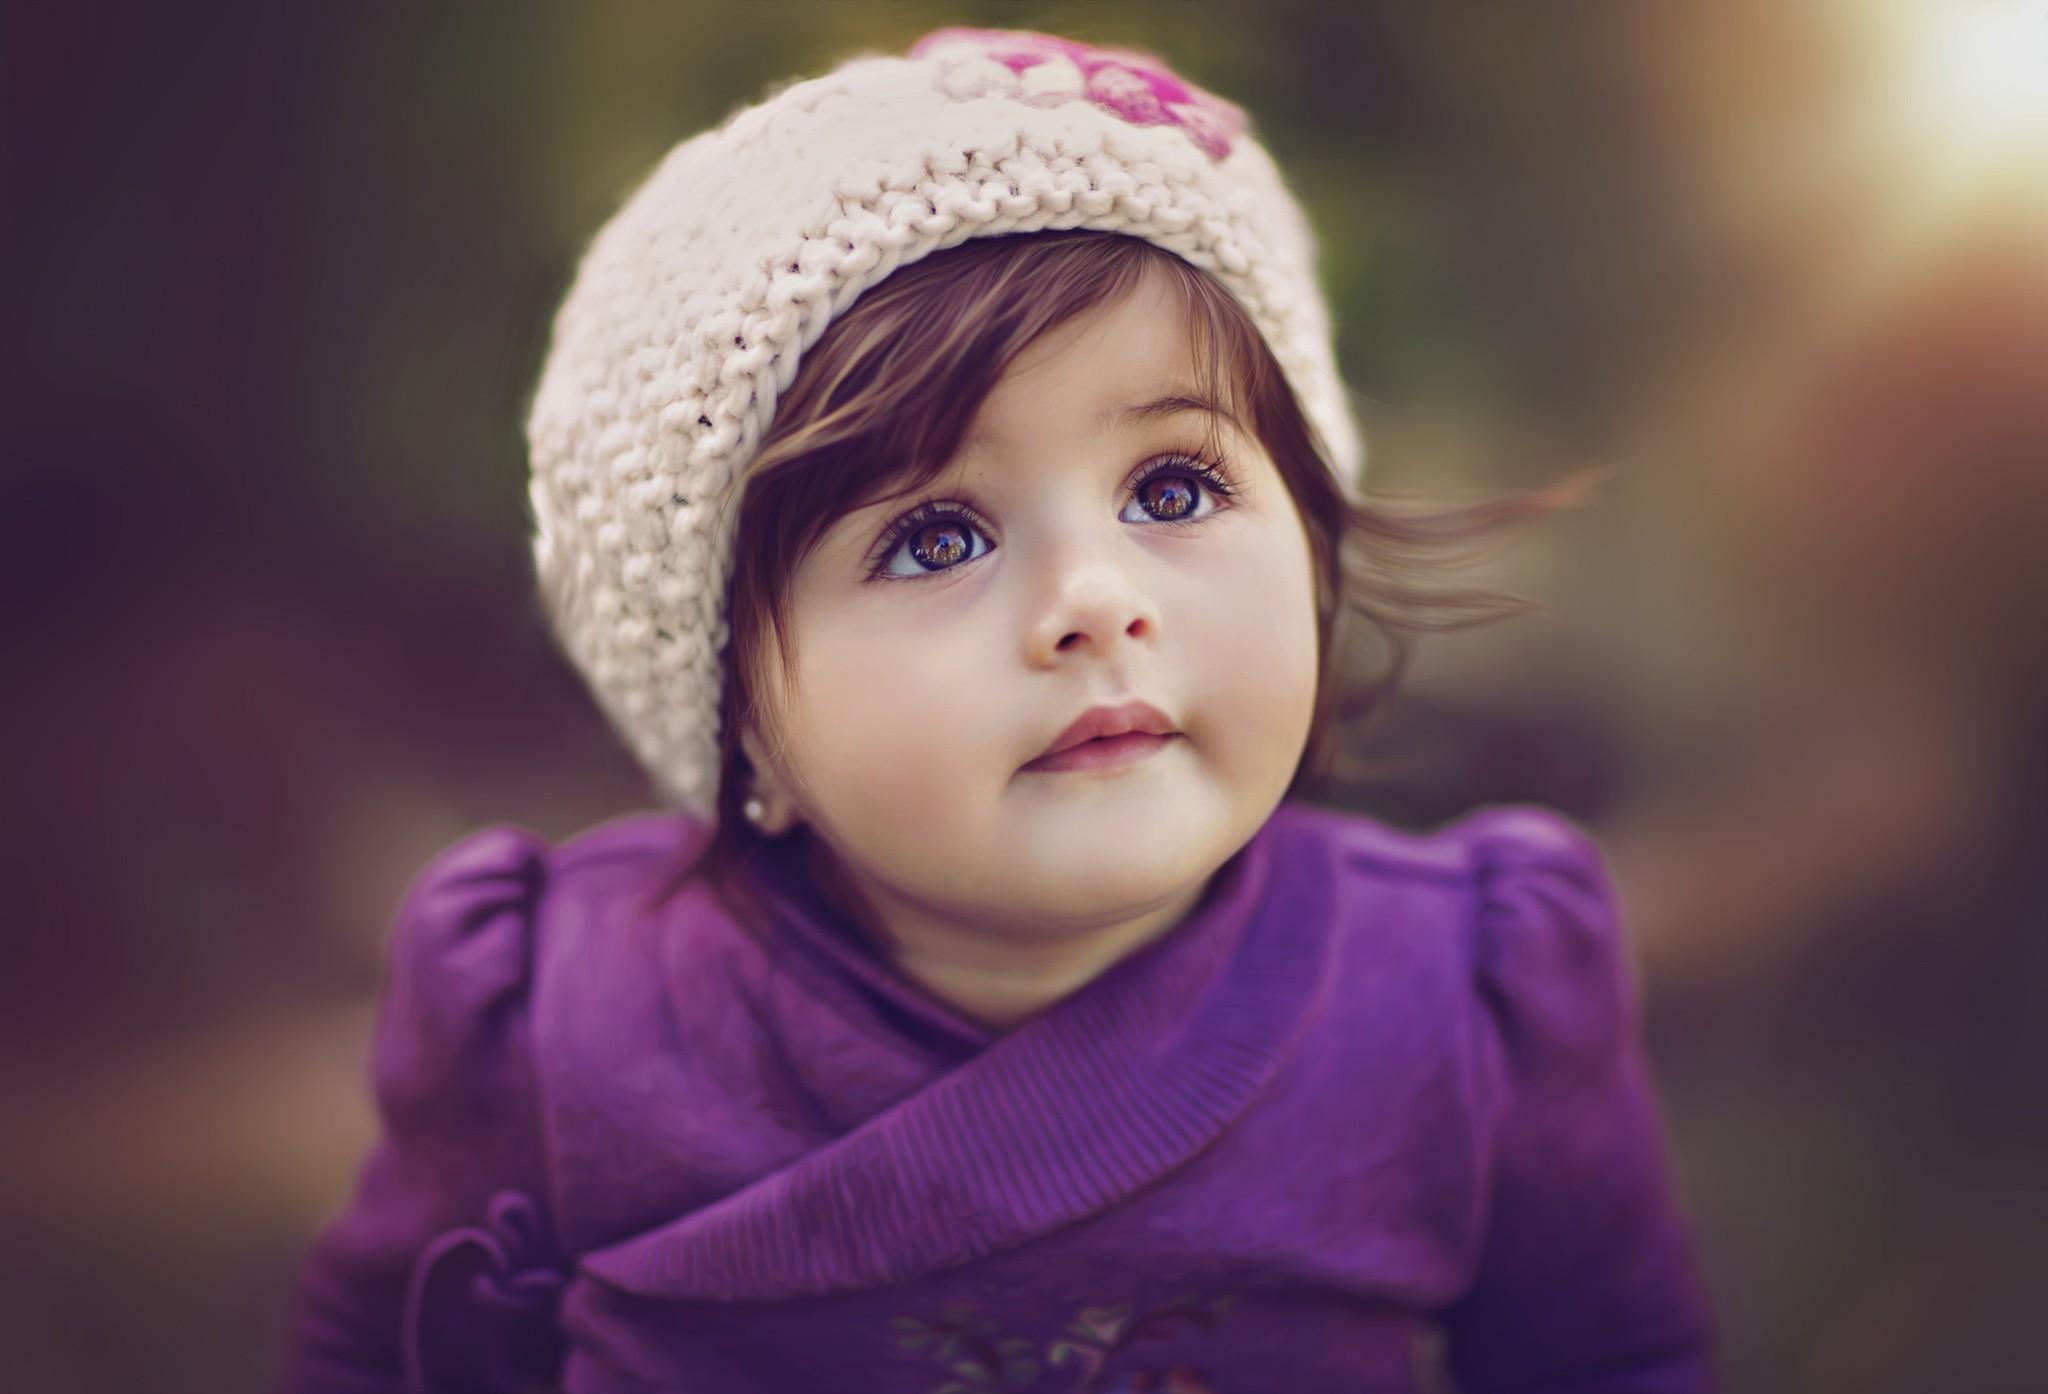 Cute Baby Girl Kids Wallpaper